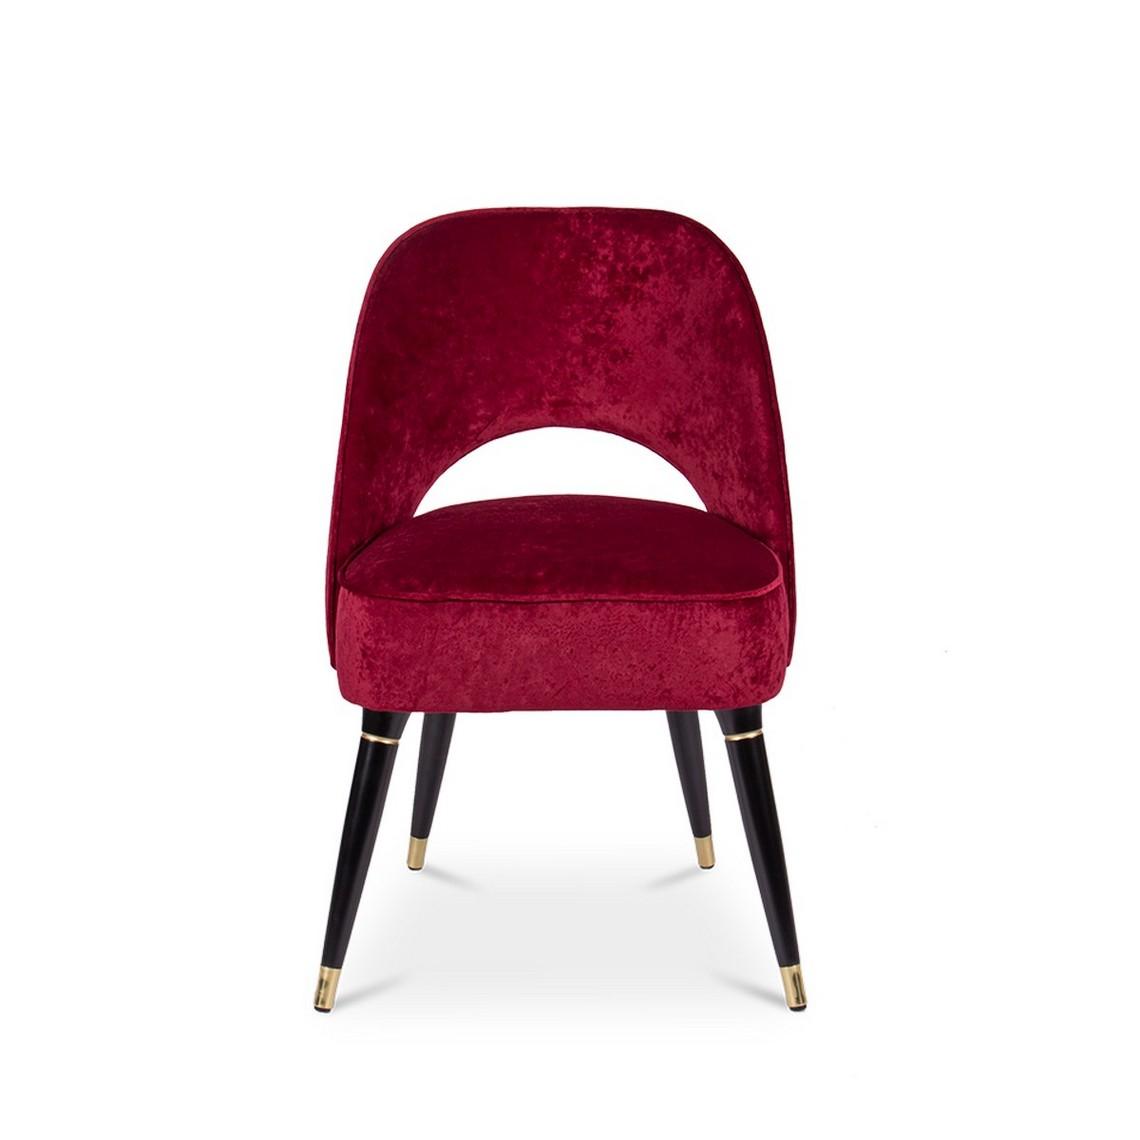 Top Velvet Dining Chairs velvet dining chairs Top Velvet Dining Chairs collins 1